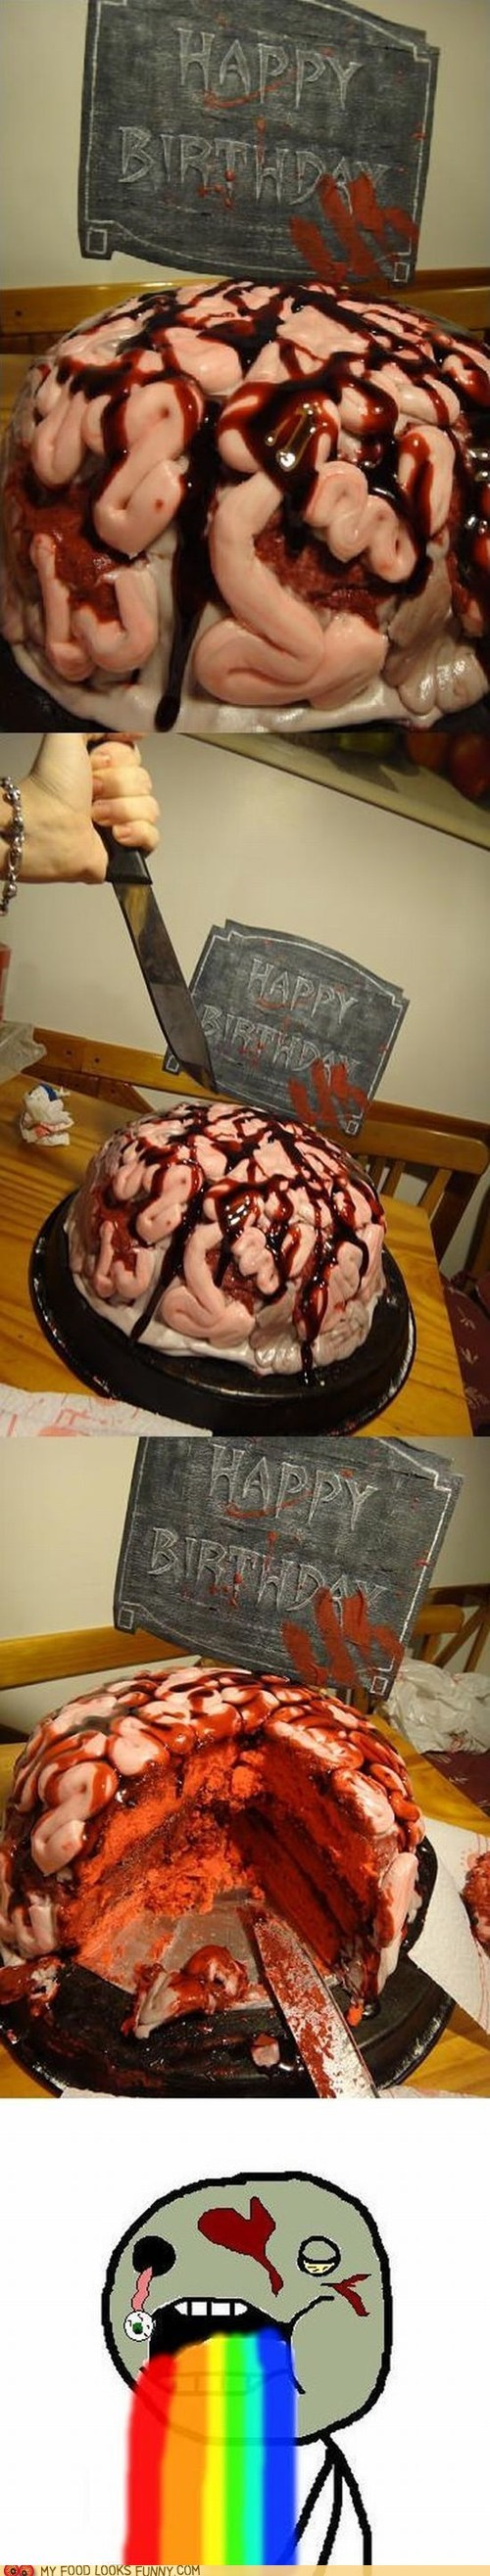 birthday brain cake fondant zombie - 6283962624